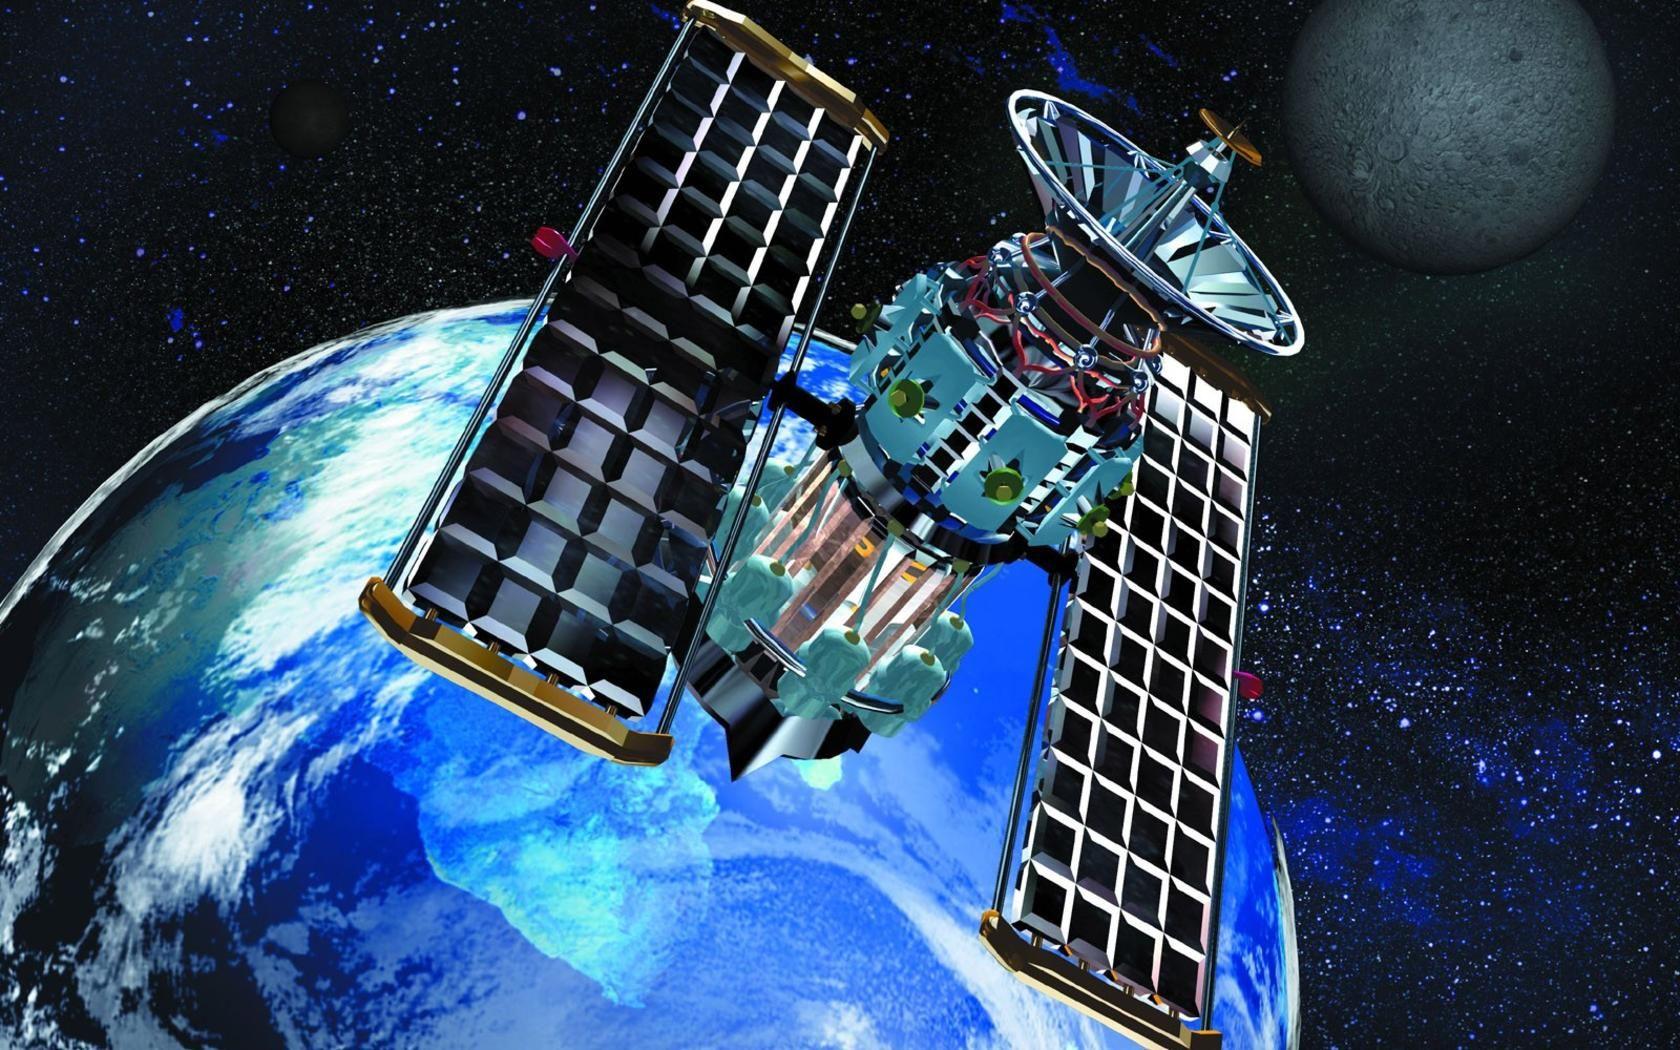 Satellite Widescreen Wide Jpg 1 680 1 050 Pixels Satellites Flat Earth Movement Satellite Image